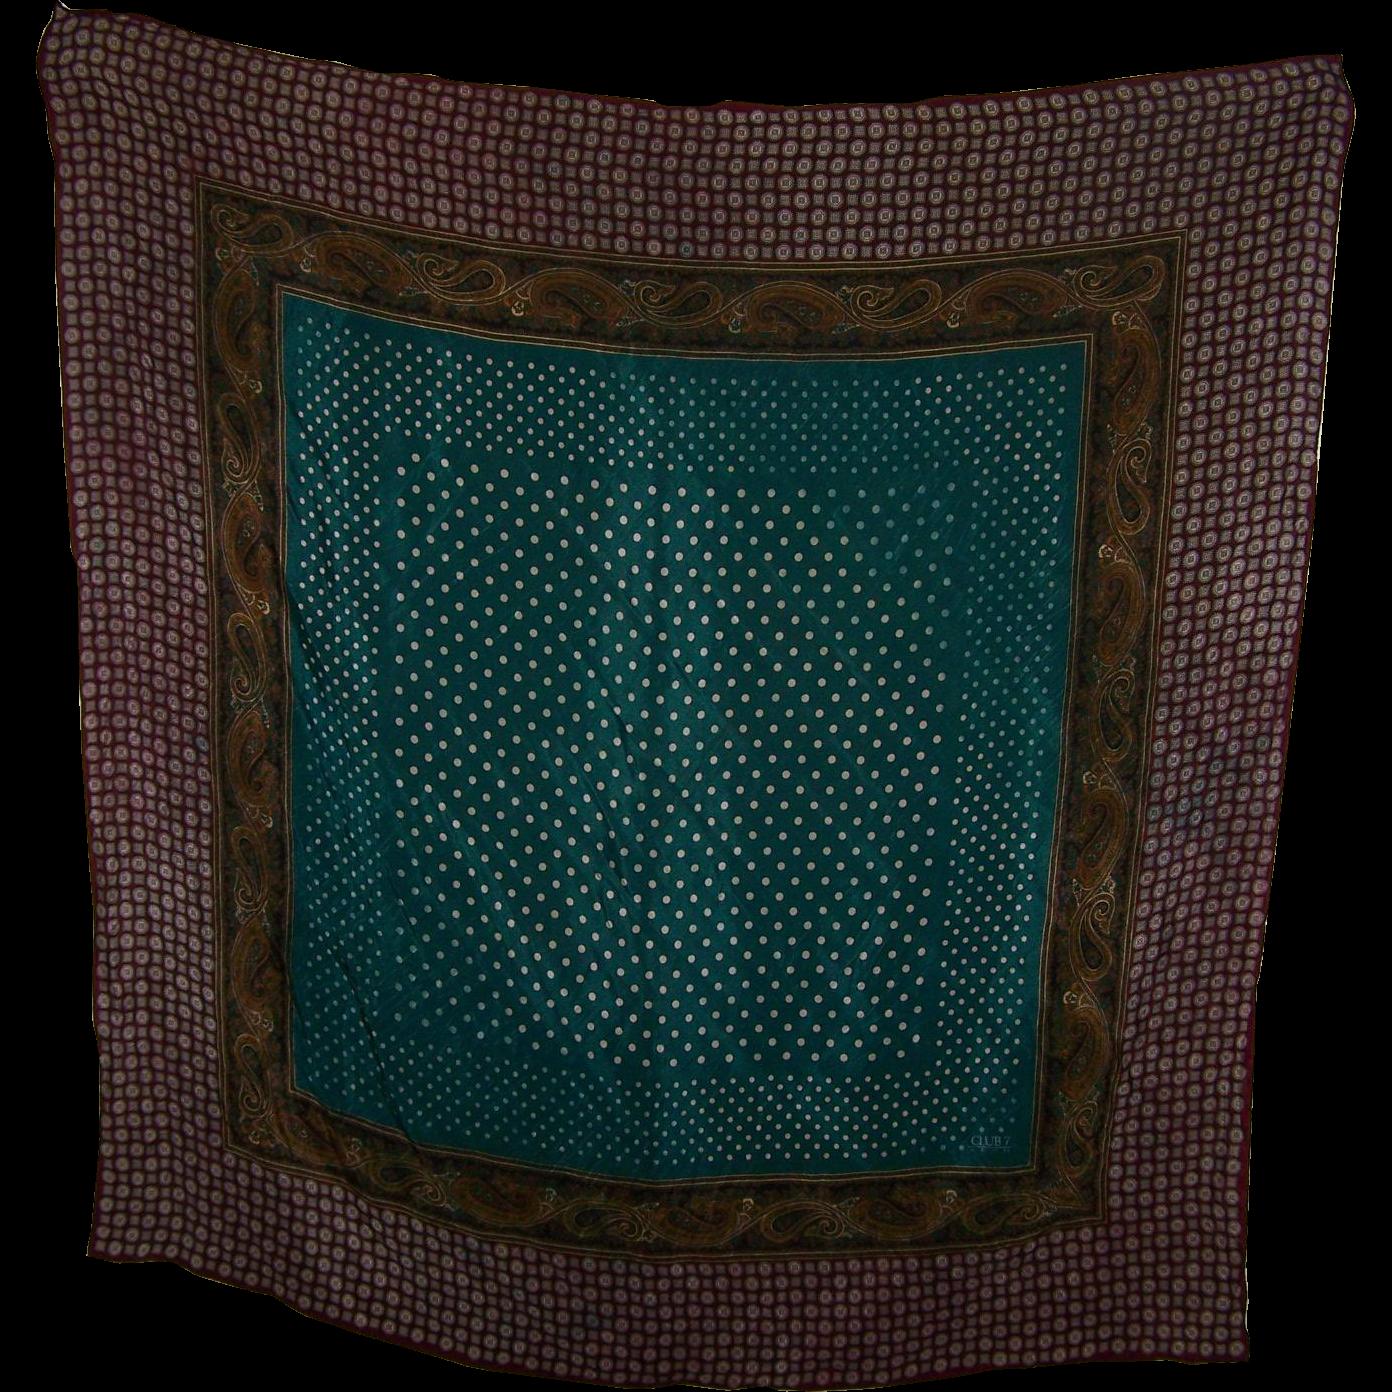 Decorative  Op Art Designer Signed Silk Scarf Club 7 Echo Polka Dots Paisley Geometric Print